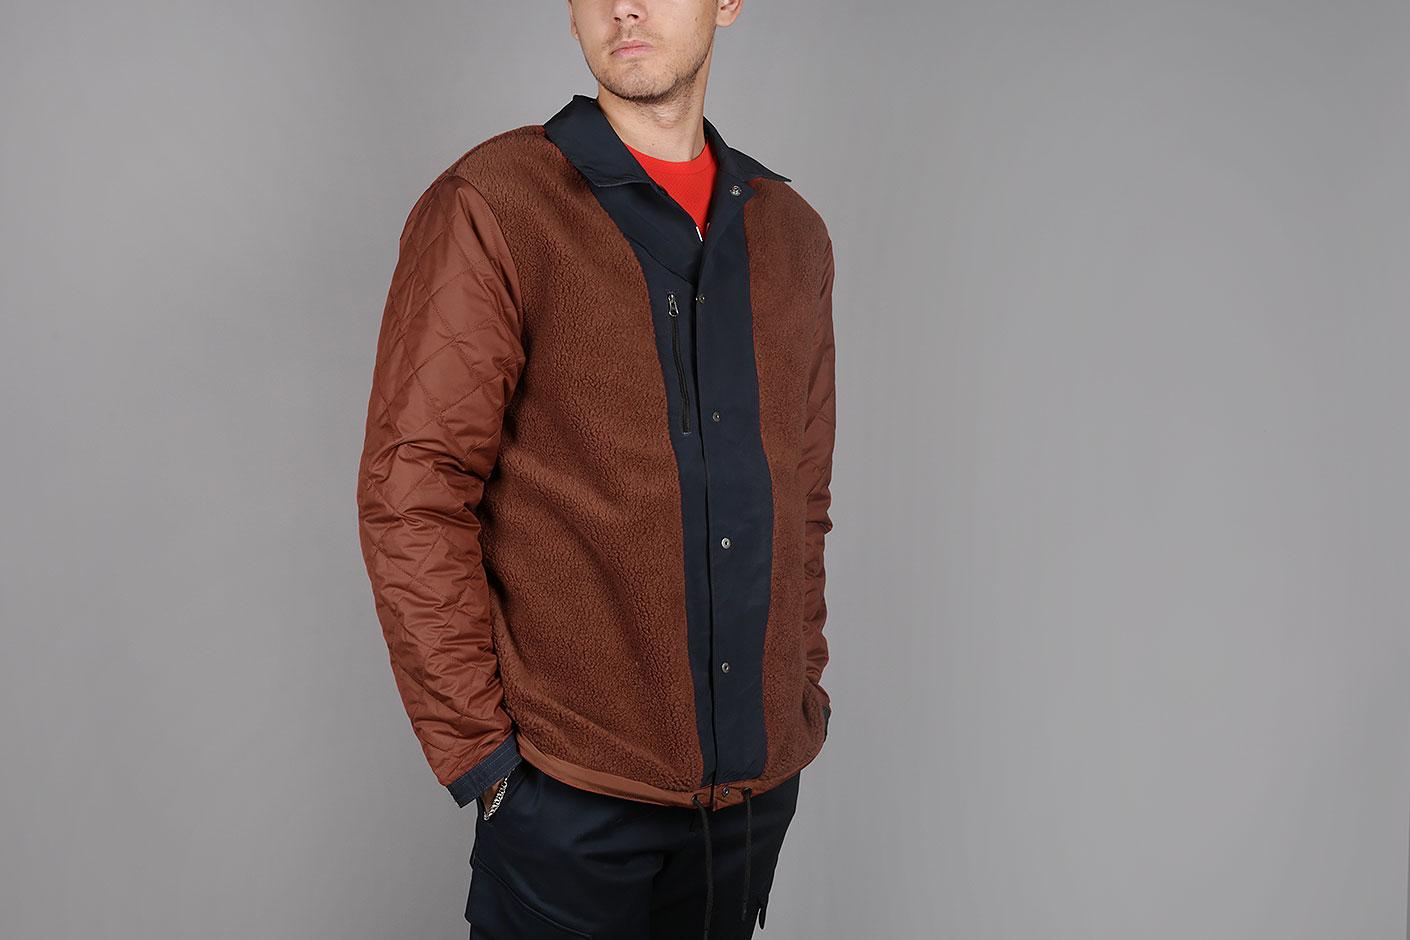 6be1929a8f79 ... Мужская синяя куртка Nike Nike X Patta NRG Coach Jacket - фото 6  картинки ...